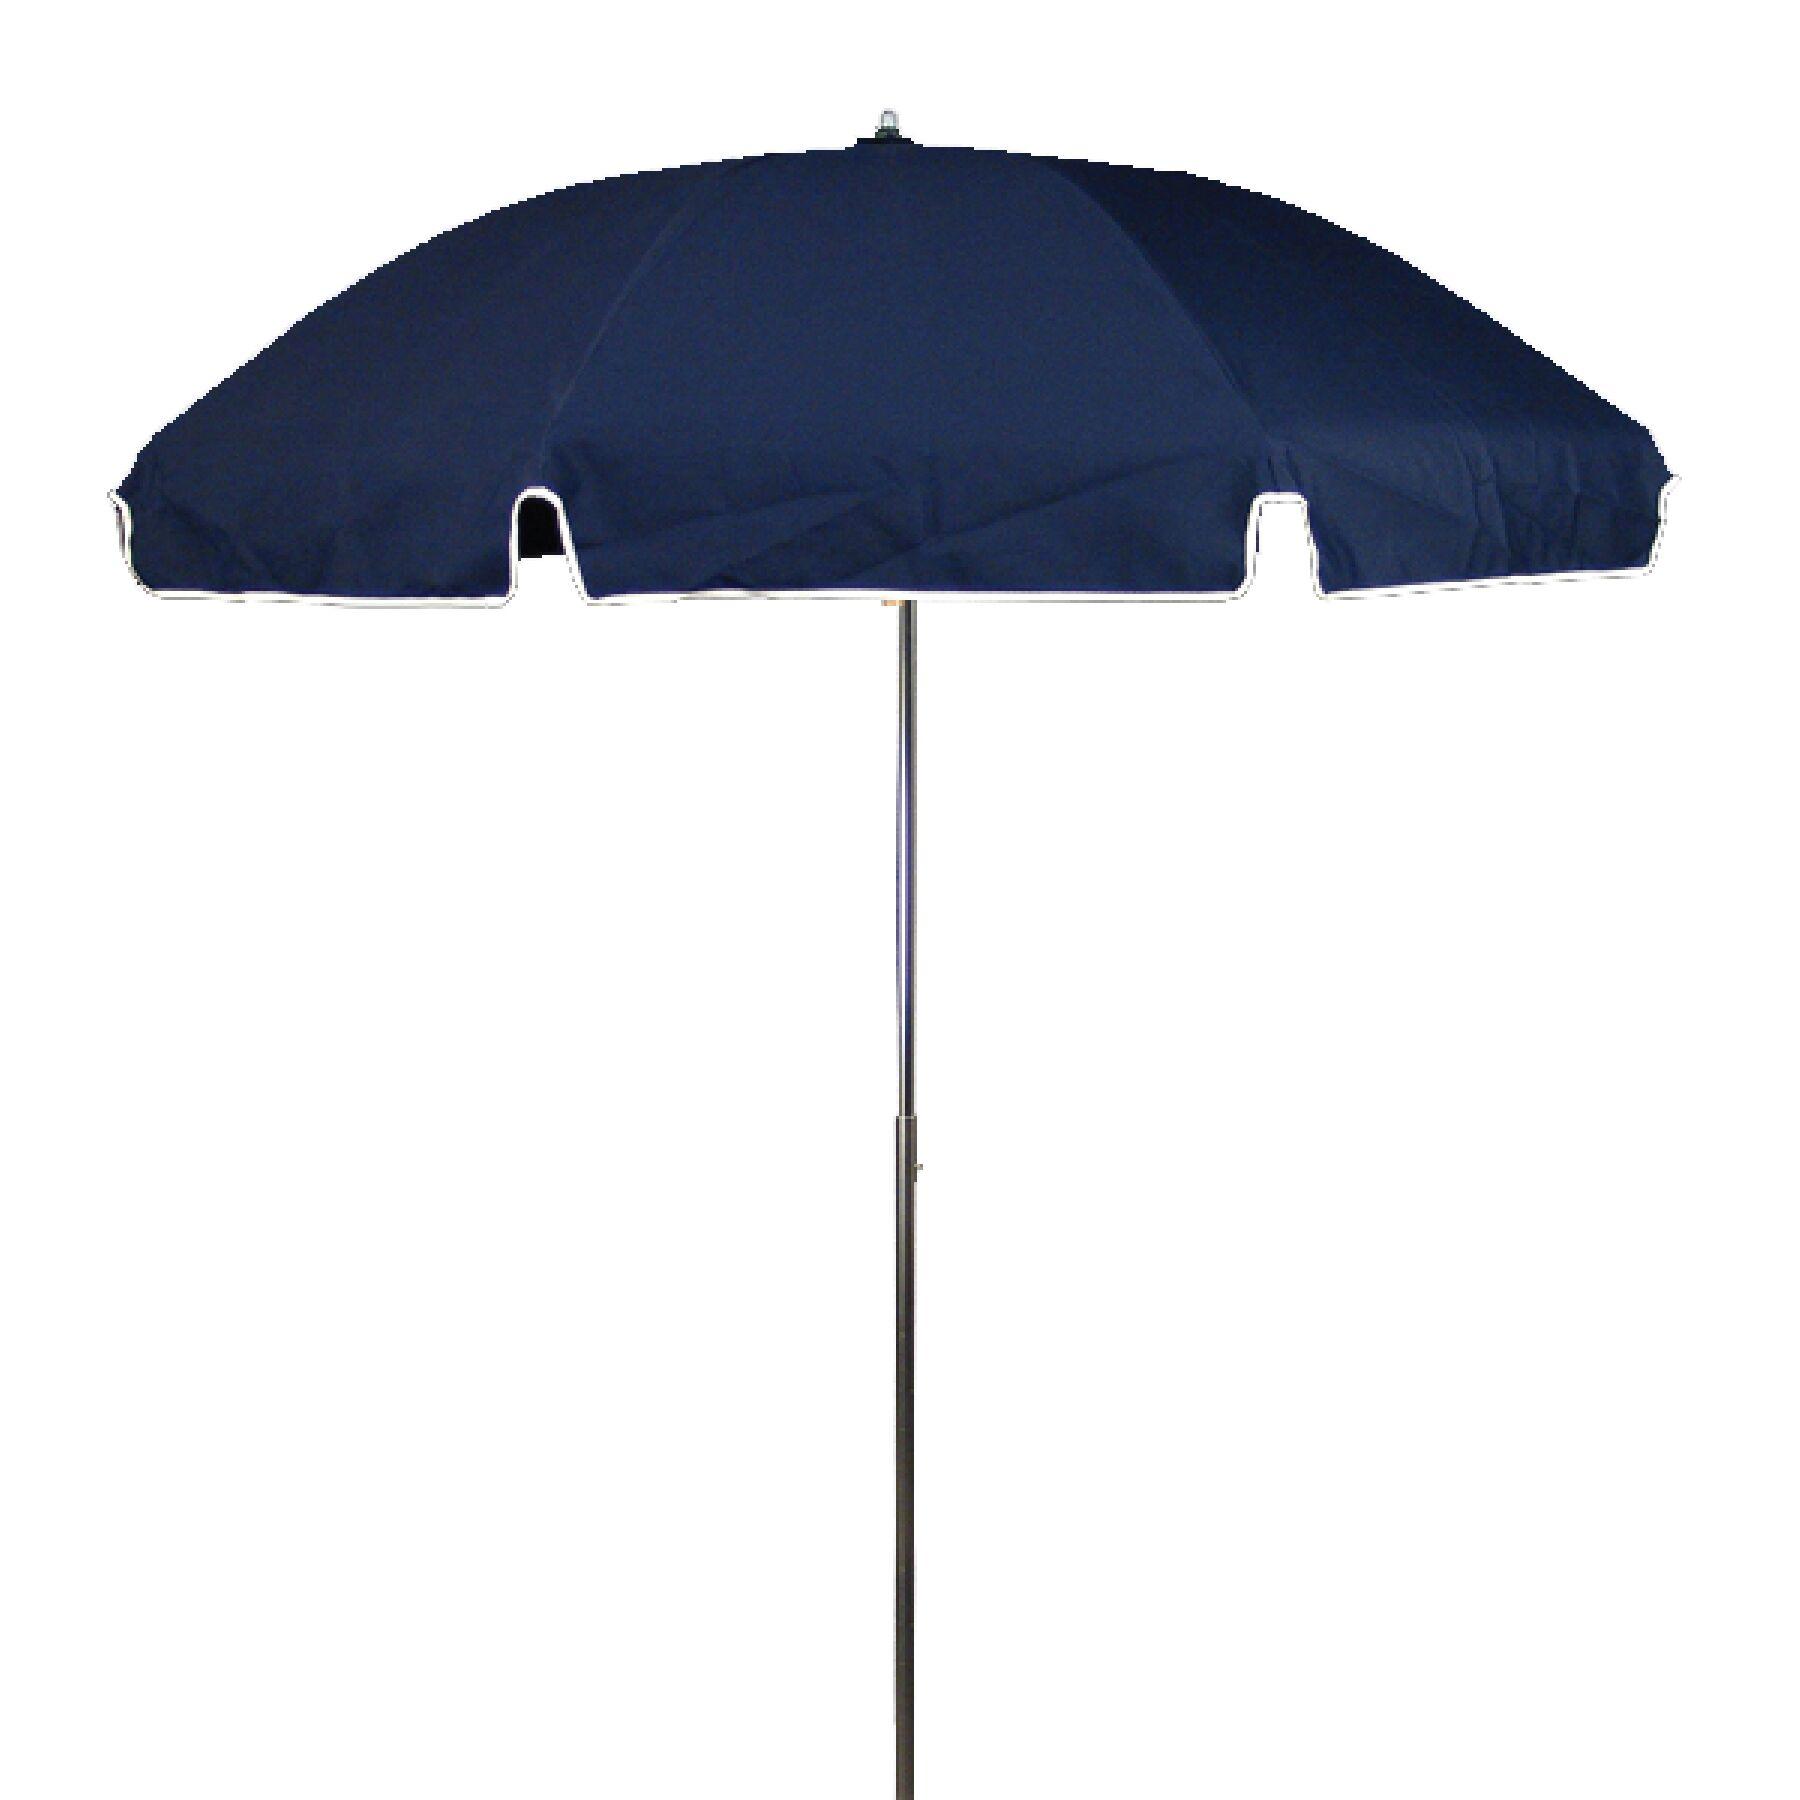 7.5' Drape Umbrella Fabric: Navy Blue